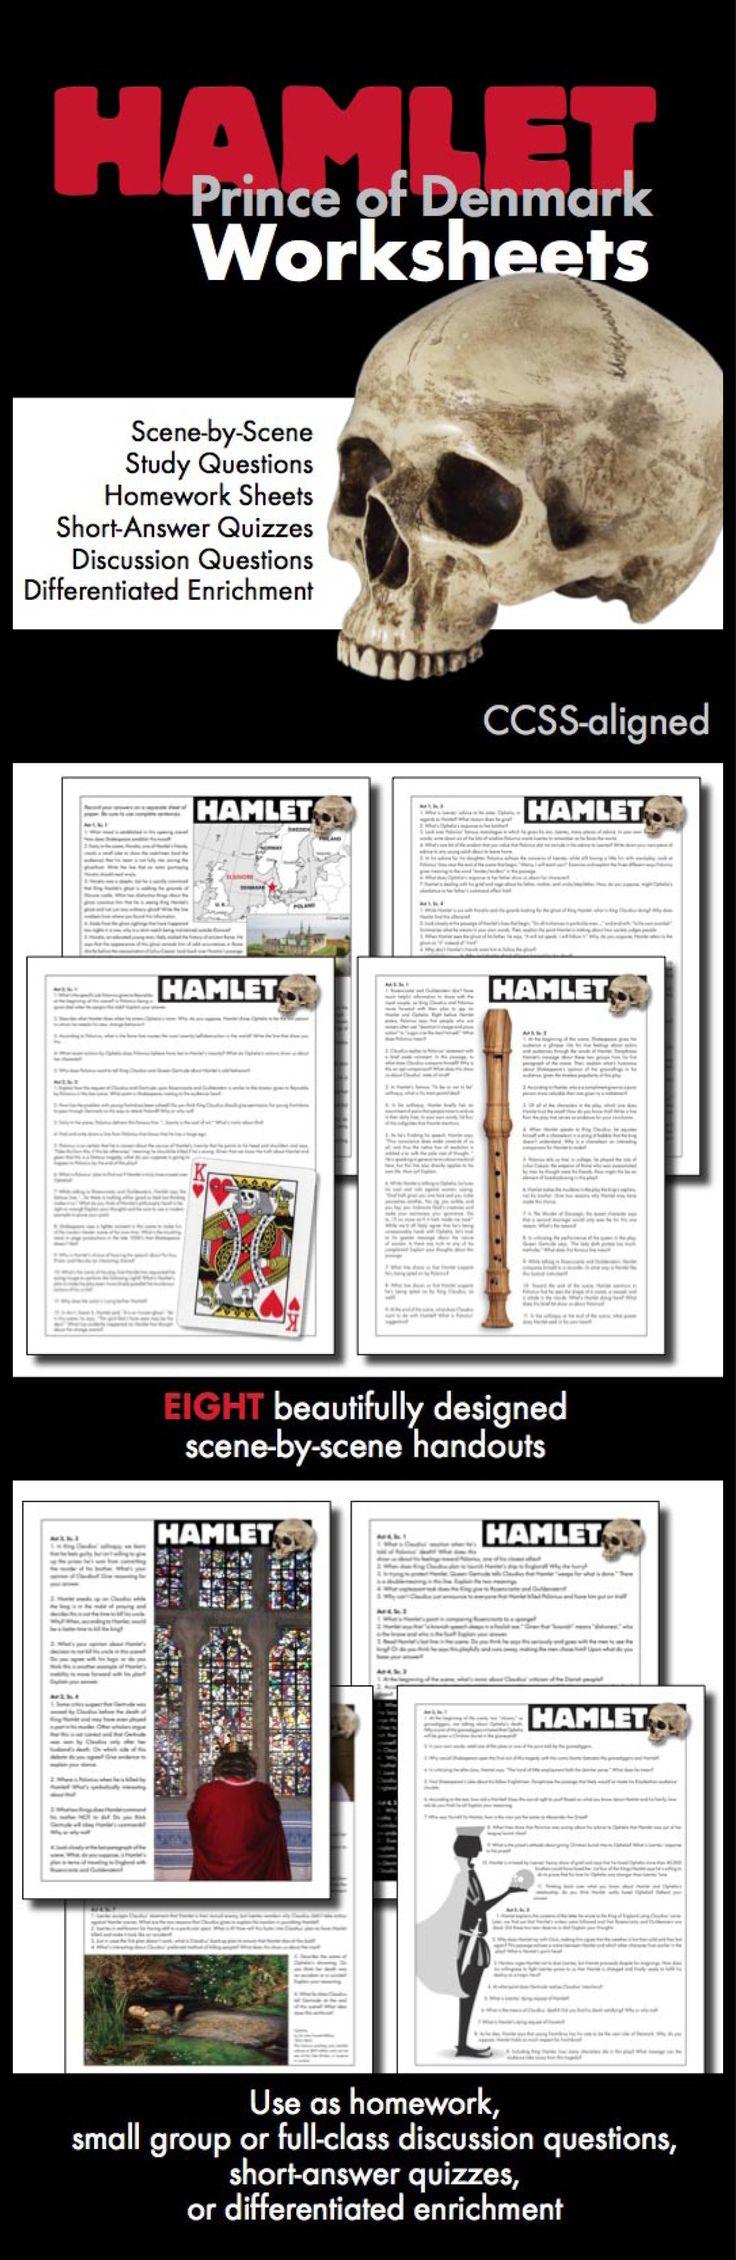 Workbooks shakespeare worksheets : 196 best Shakespeare images on Pinterest   School, Theater and ...